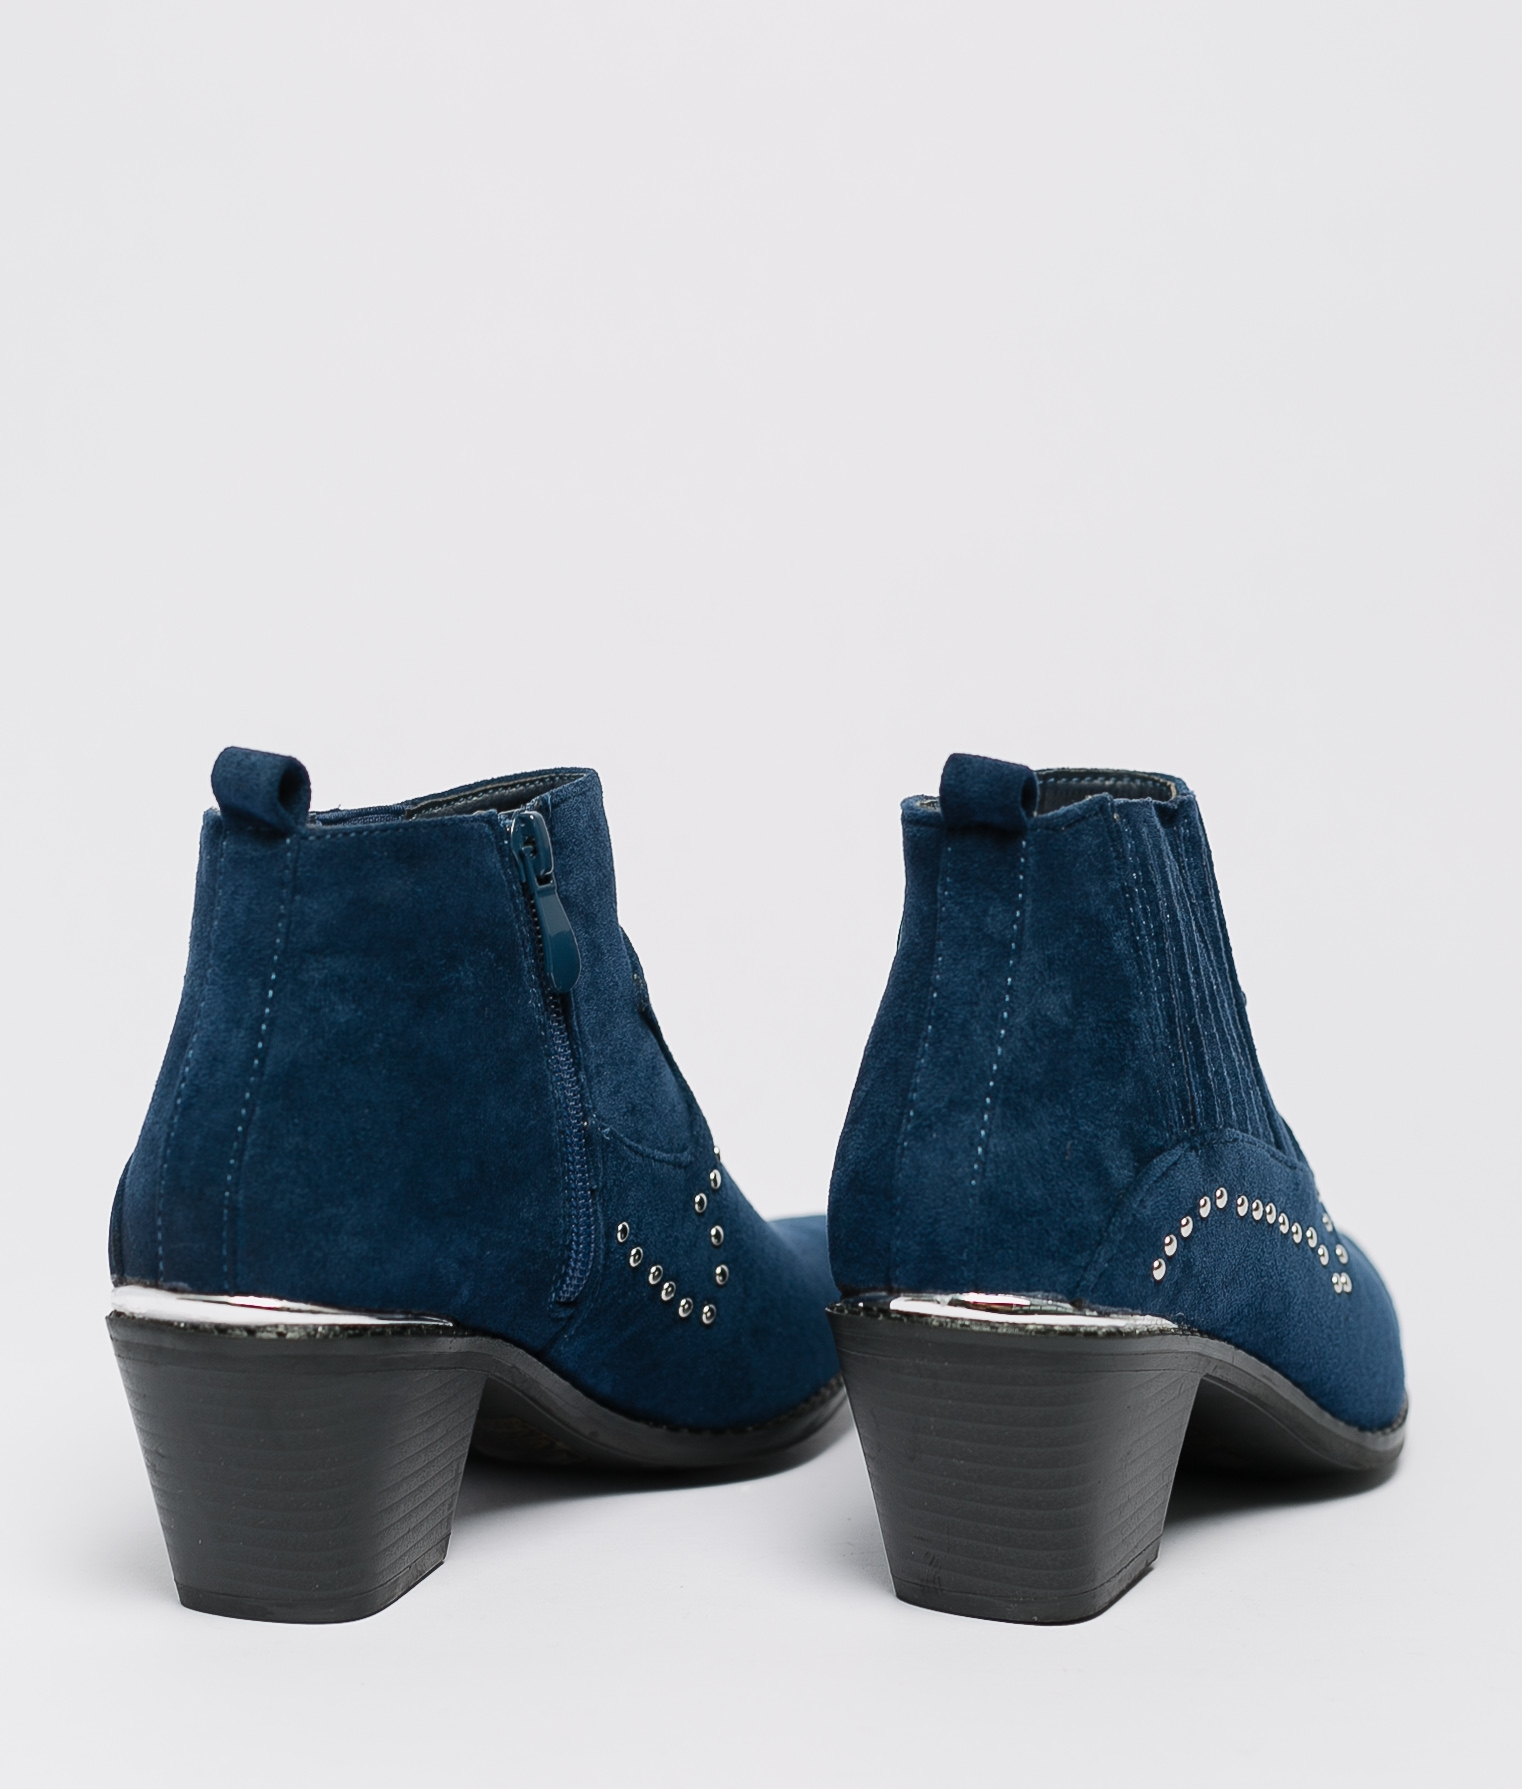 Bota Basso Sanae - Blu